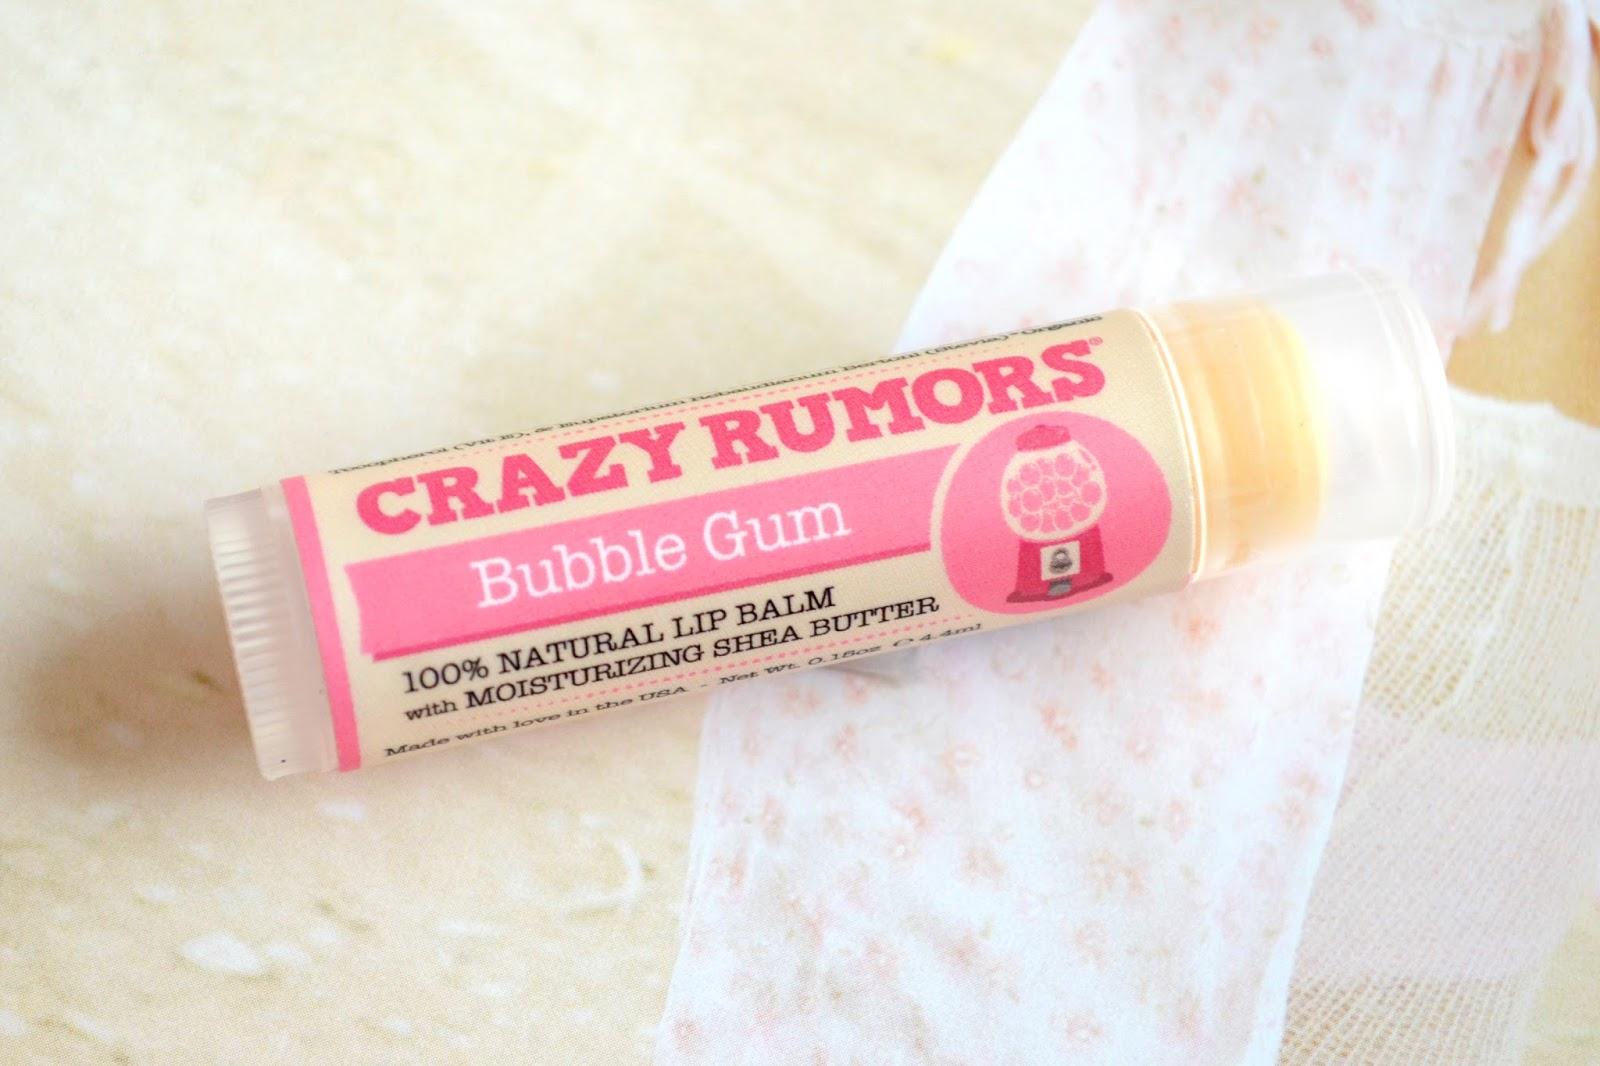 Crazy Rumors bubblegum lip balm review, crazy rumours lip balm UK